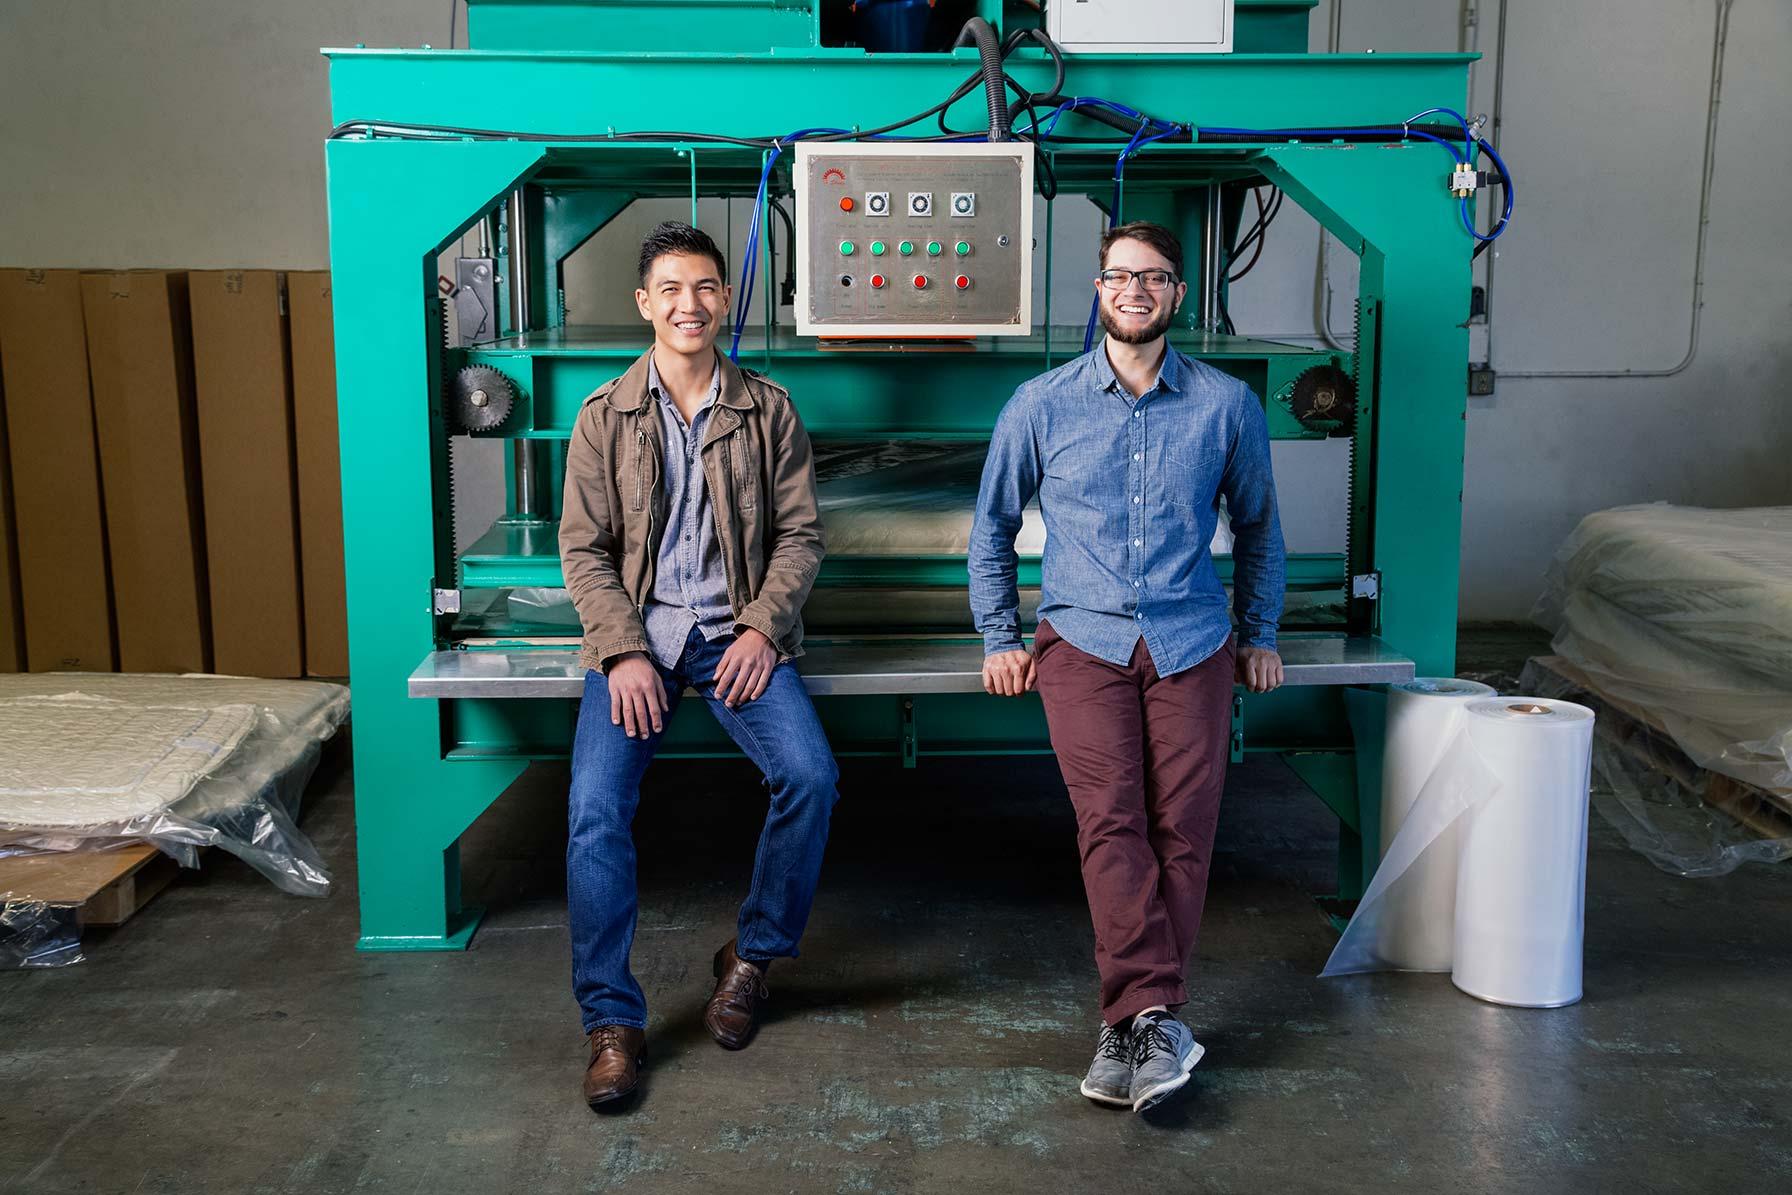 Tuft & Needle founders posing near loom